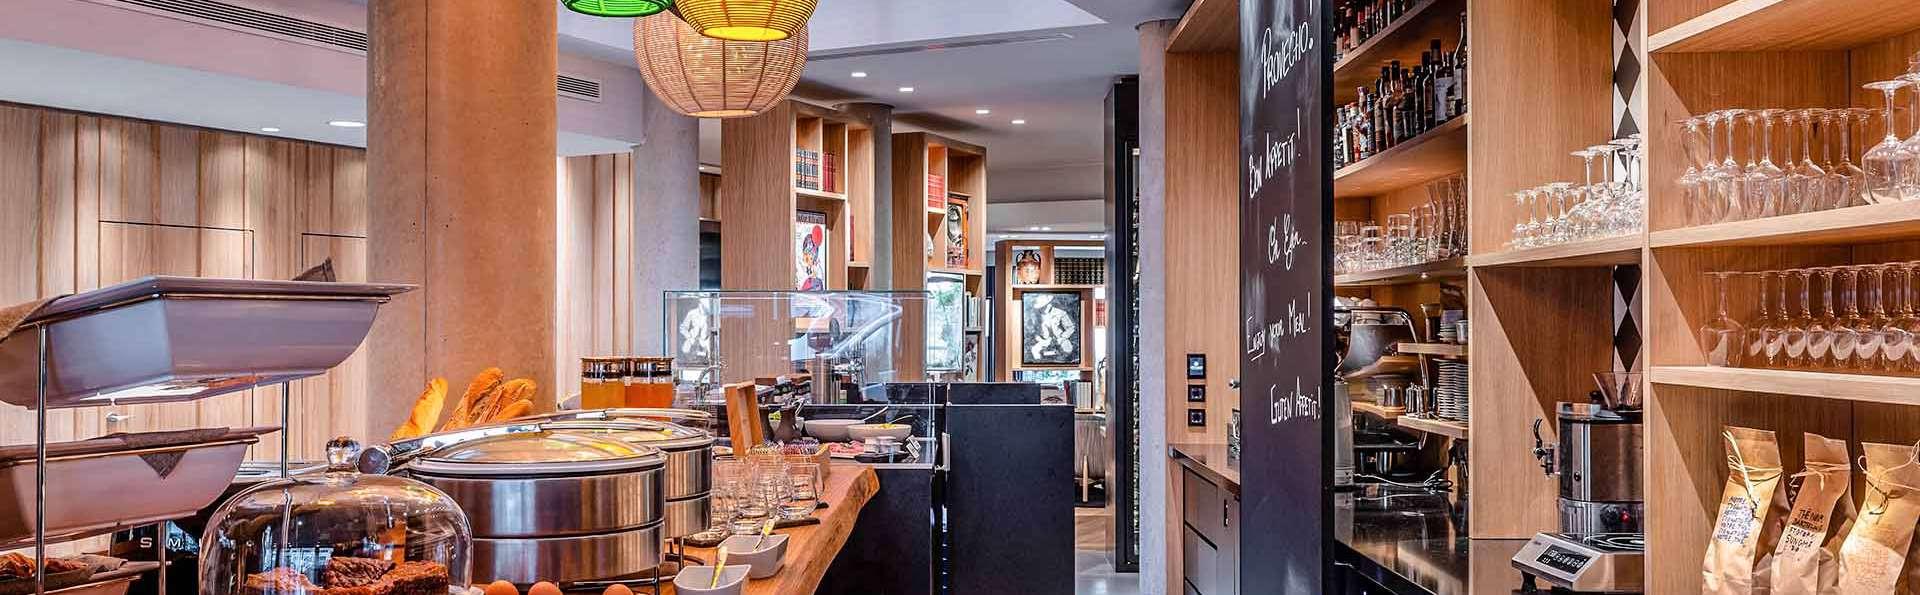 Hôtel Villa Koegui Bayonne - EDIT_vkbay_buffet_01.jpg